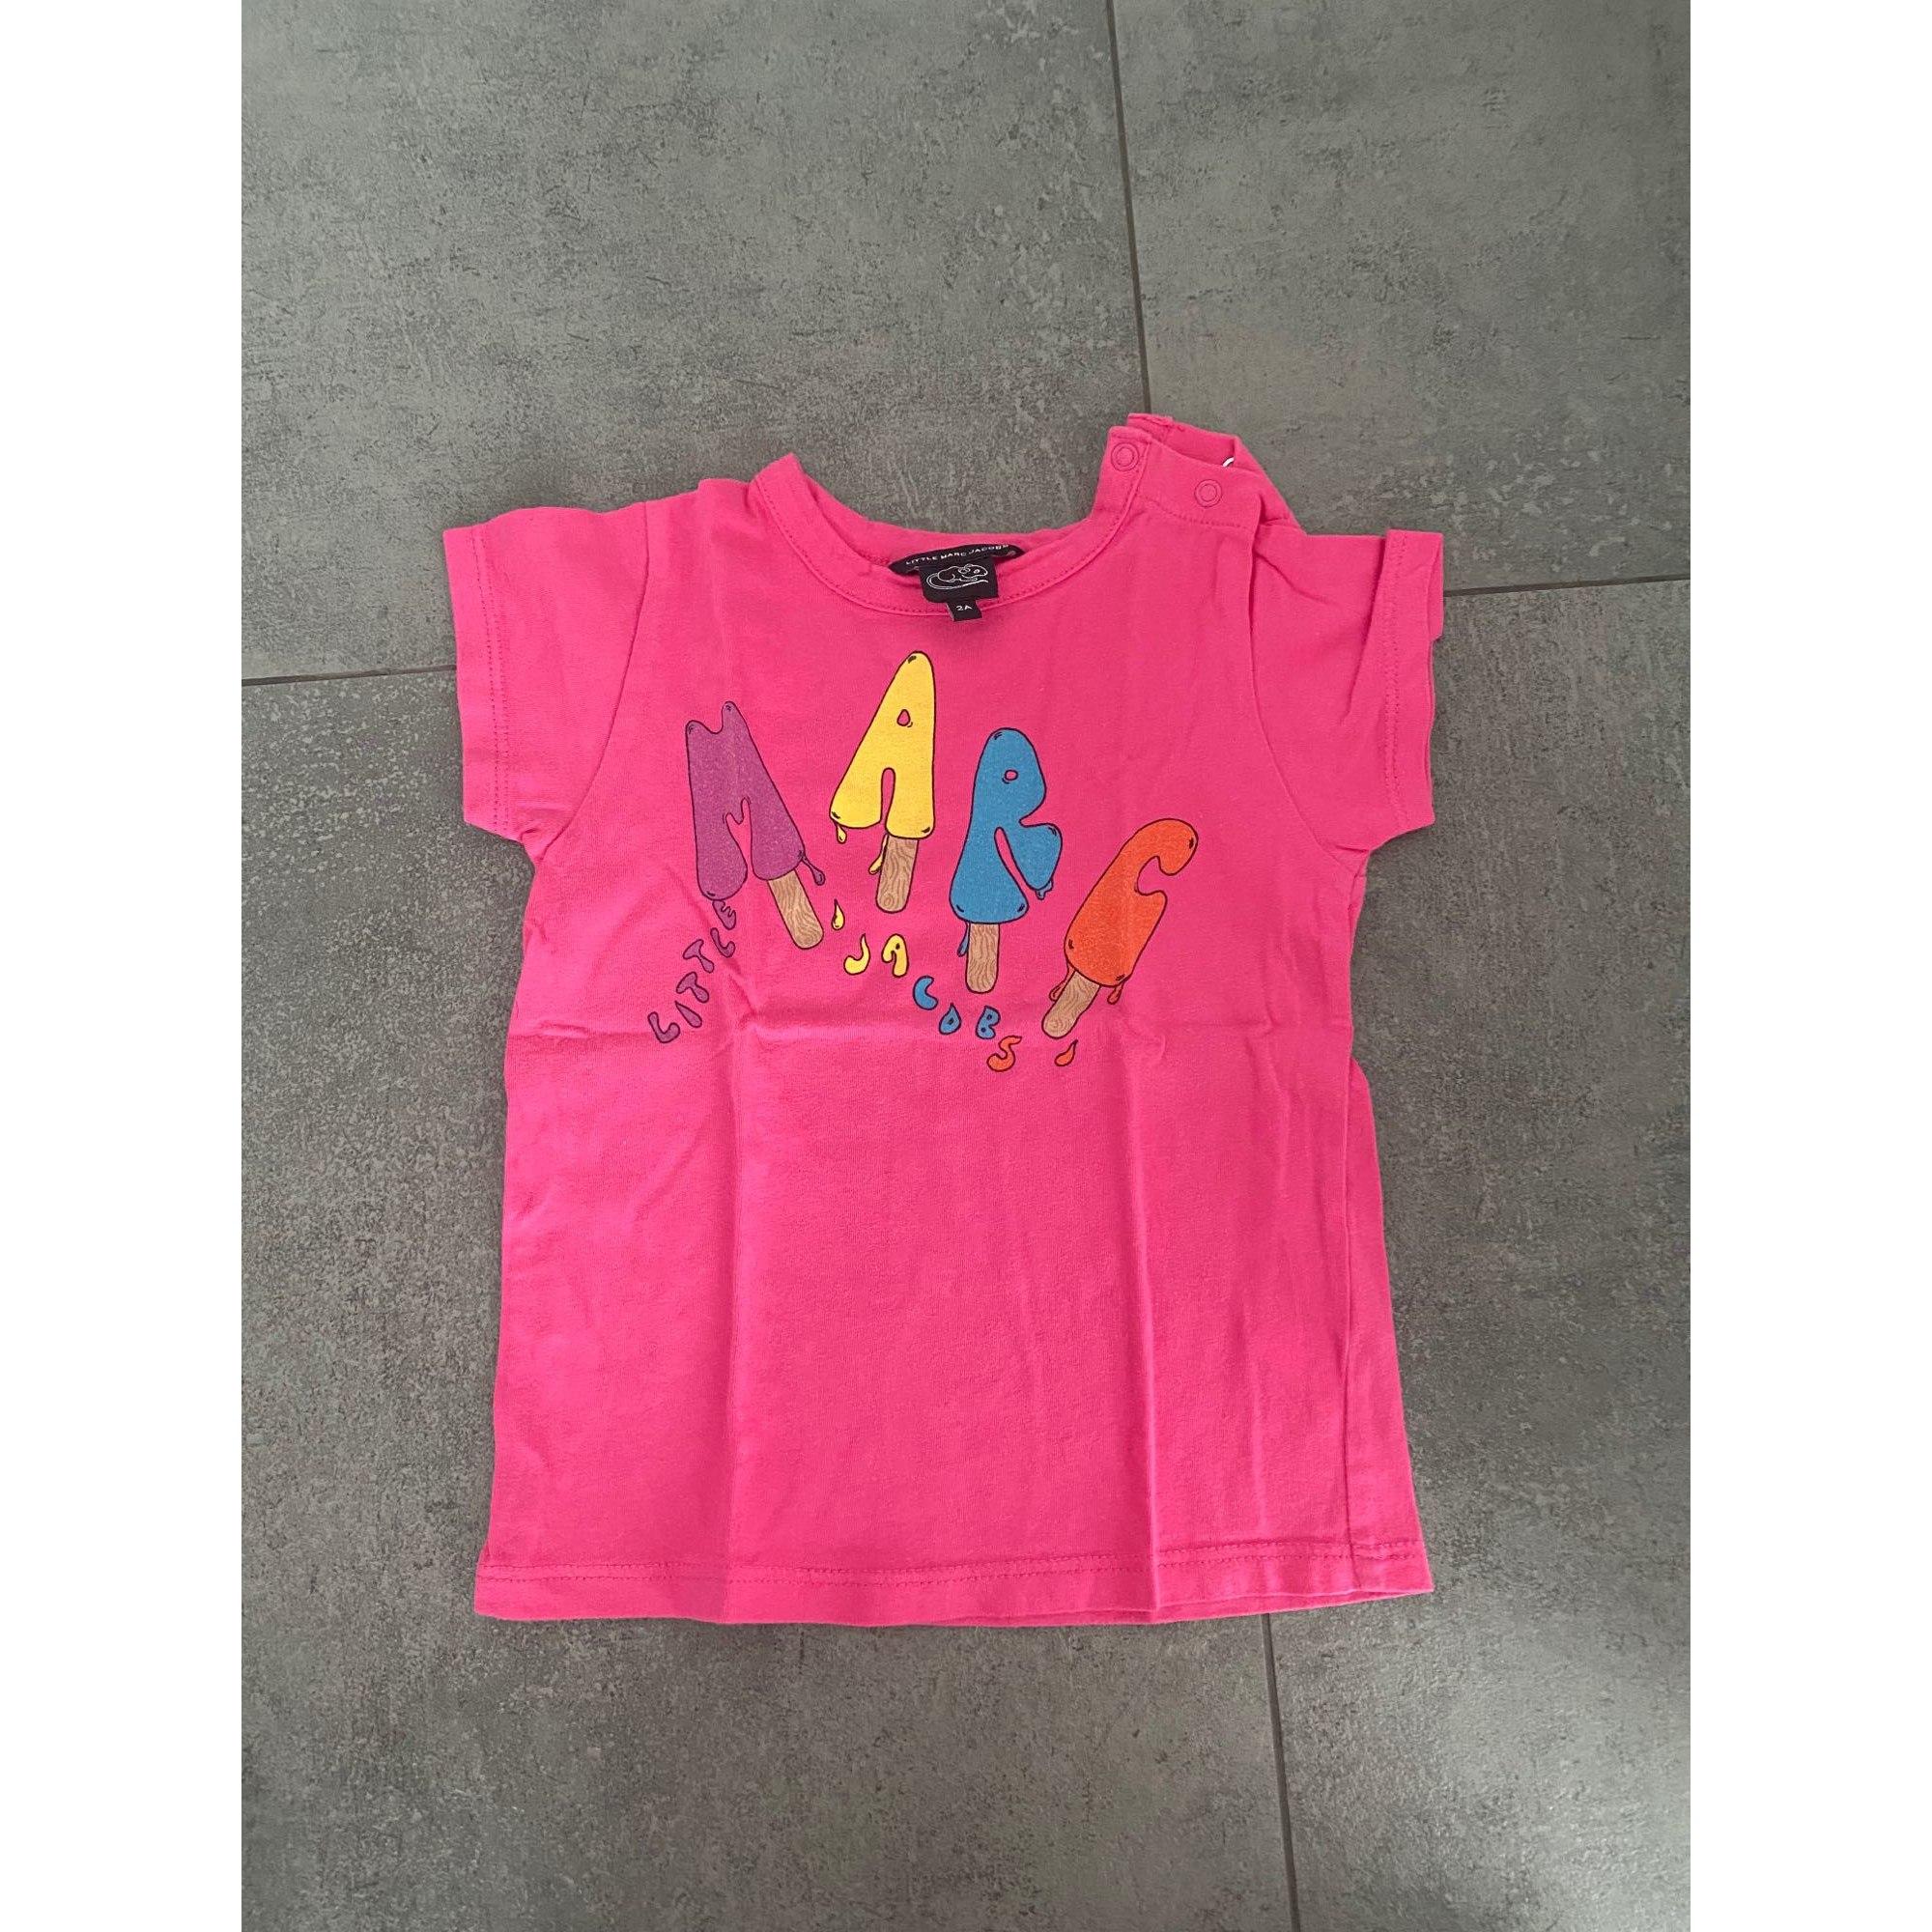 Top, tee shirt MARC JACOBS Rose, fuschia, vieux rose